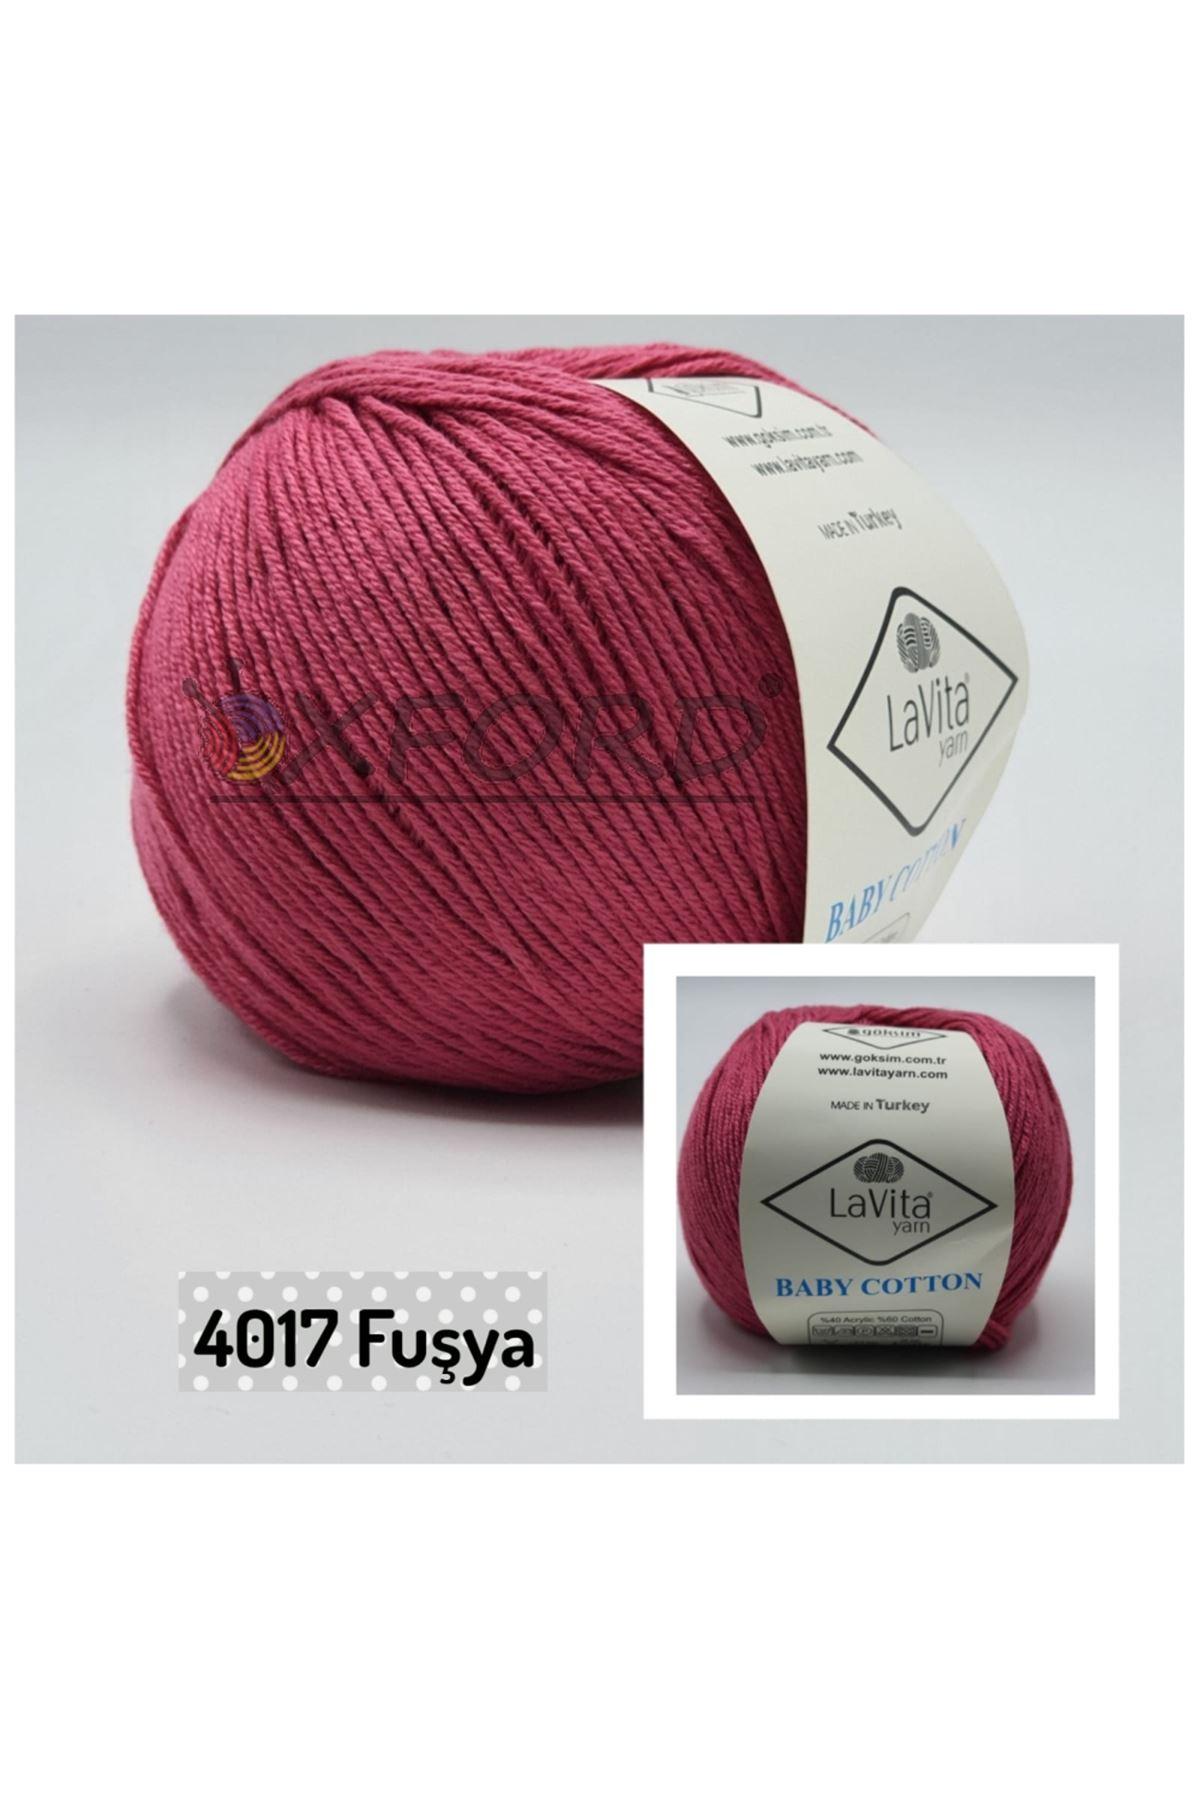 Lavita Baby Cotton 4017 Fuşya